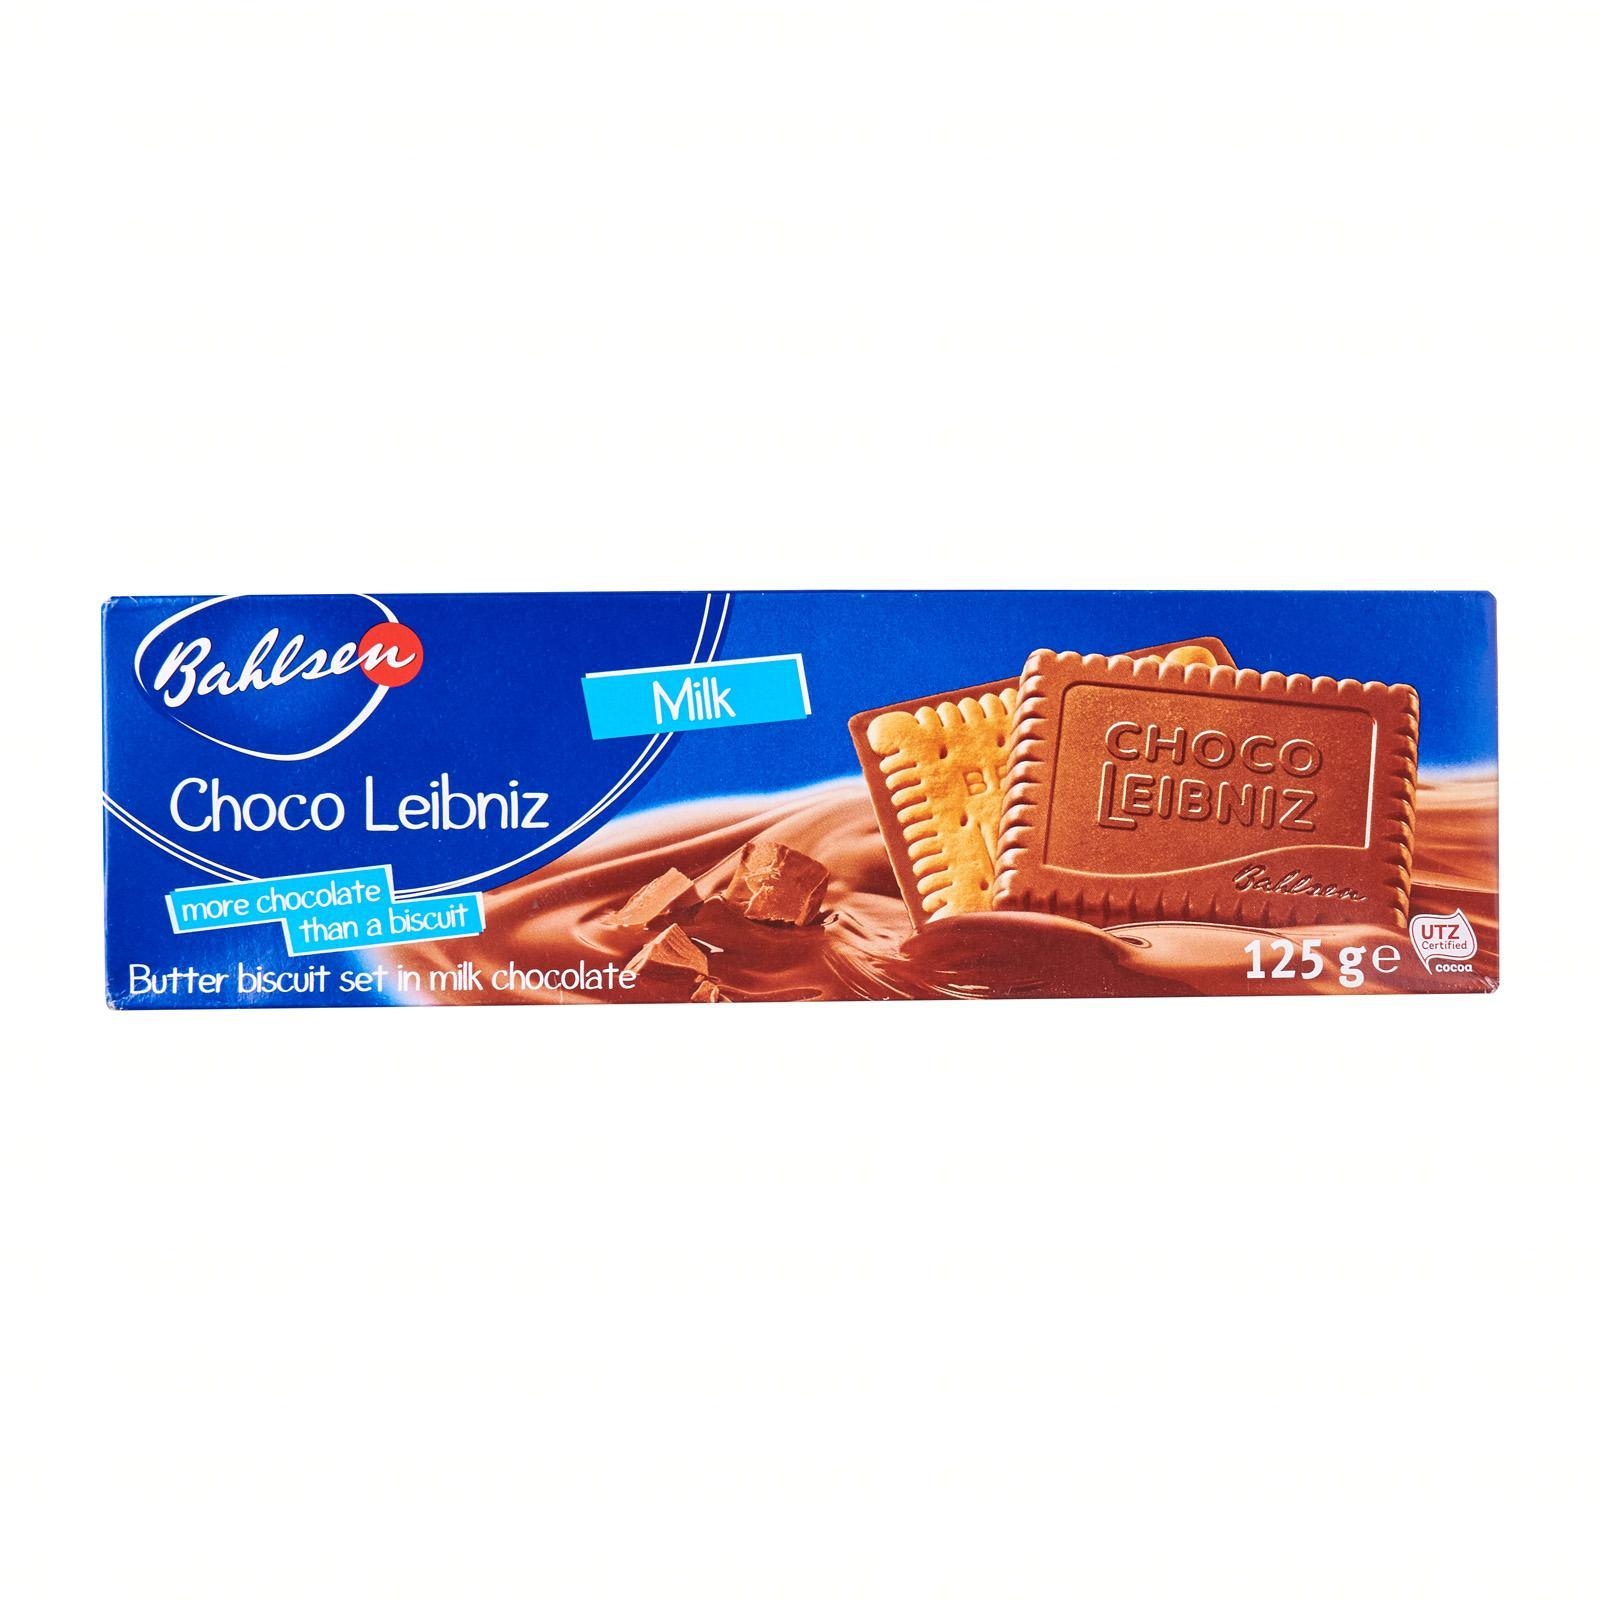 Bahlsen Choco Leibniz Milk